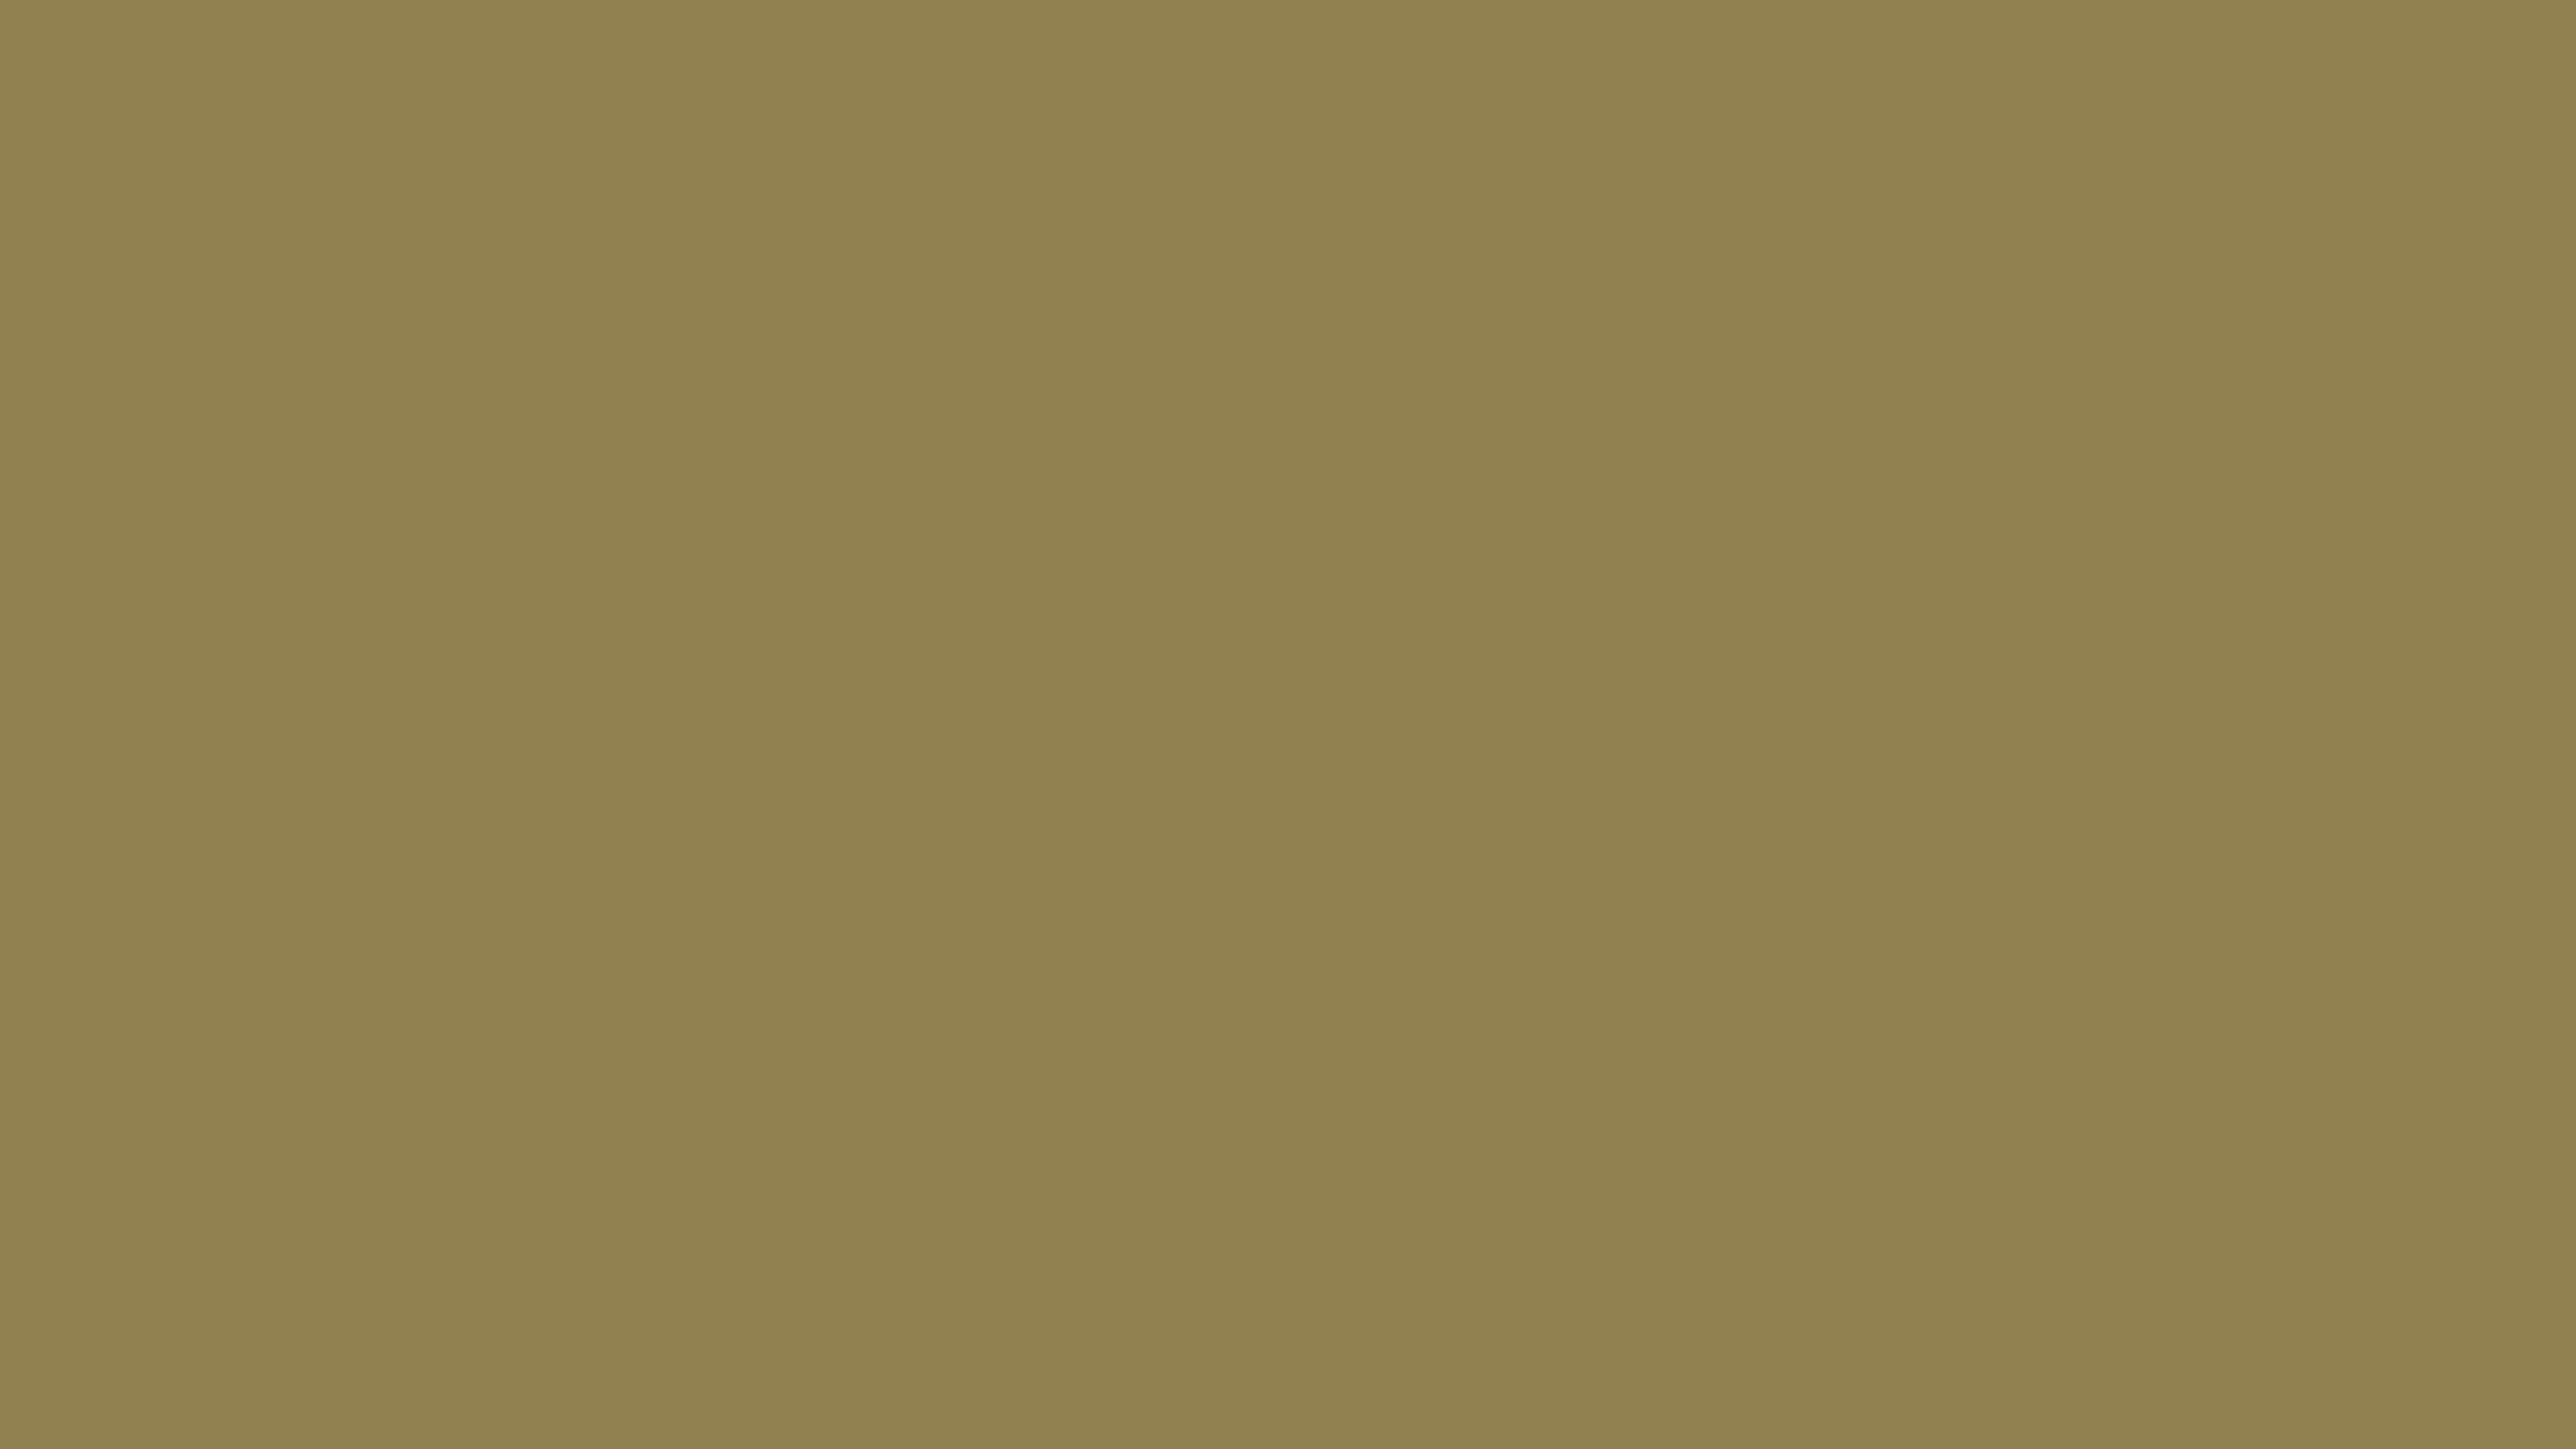 3840x2160 Dark Tan Solid Color Background